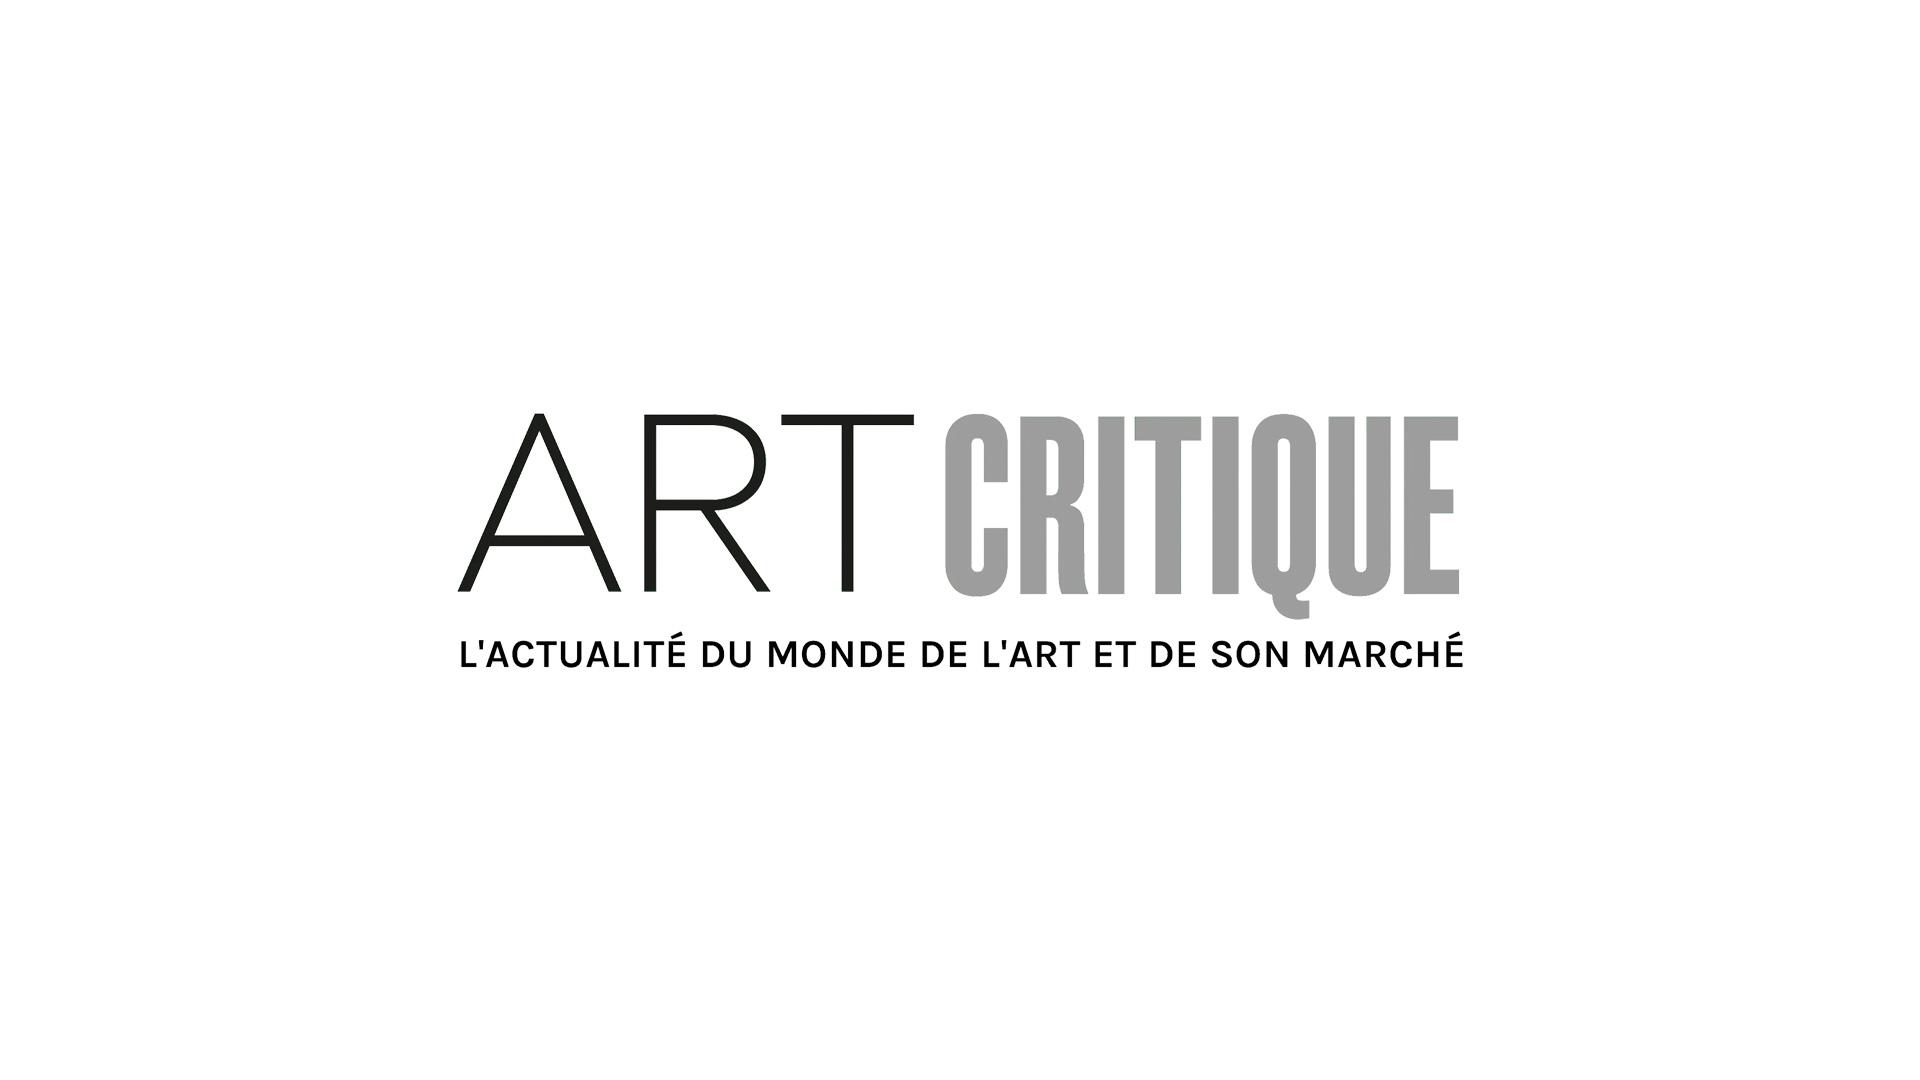 Christo to wrap Paris' Arc de Triomphe in 2020